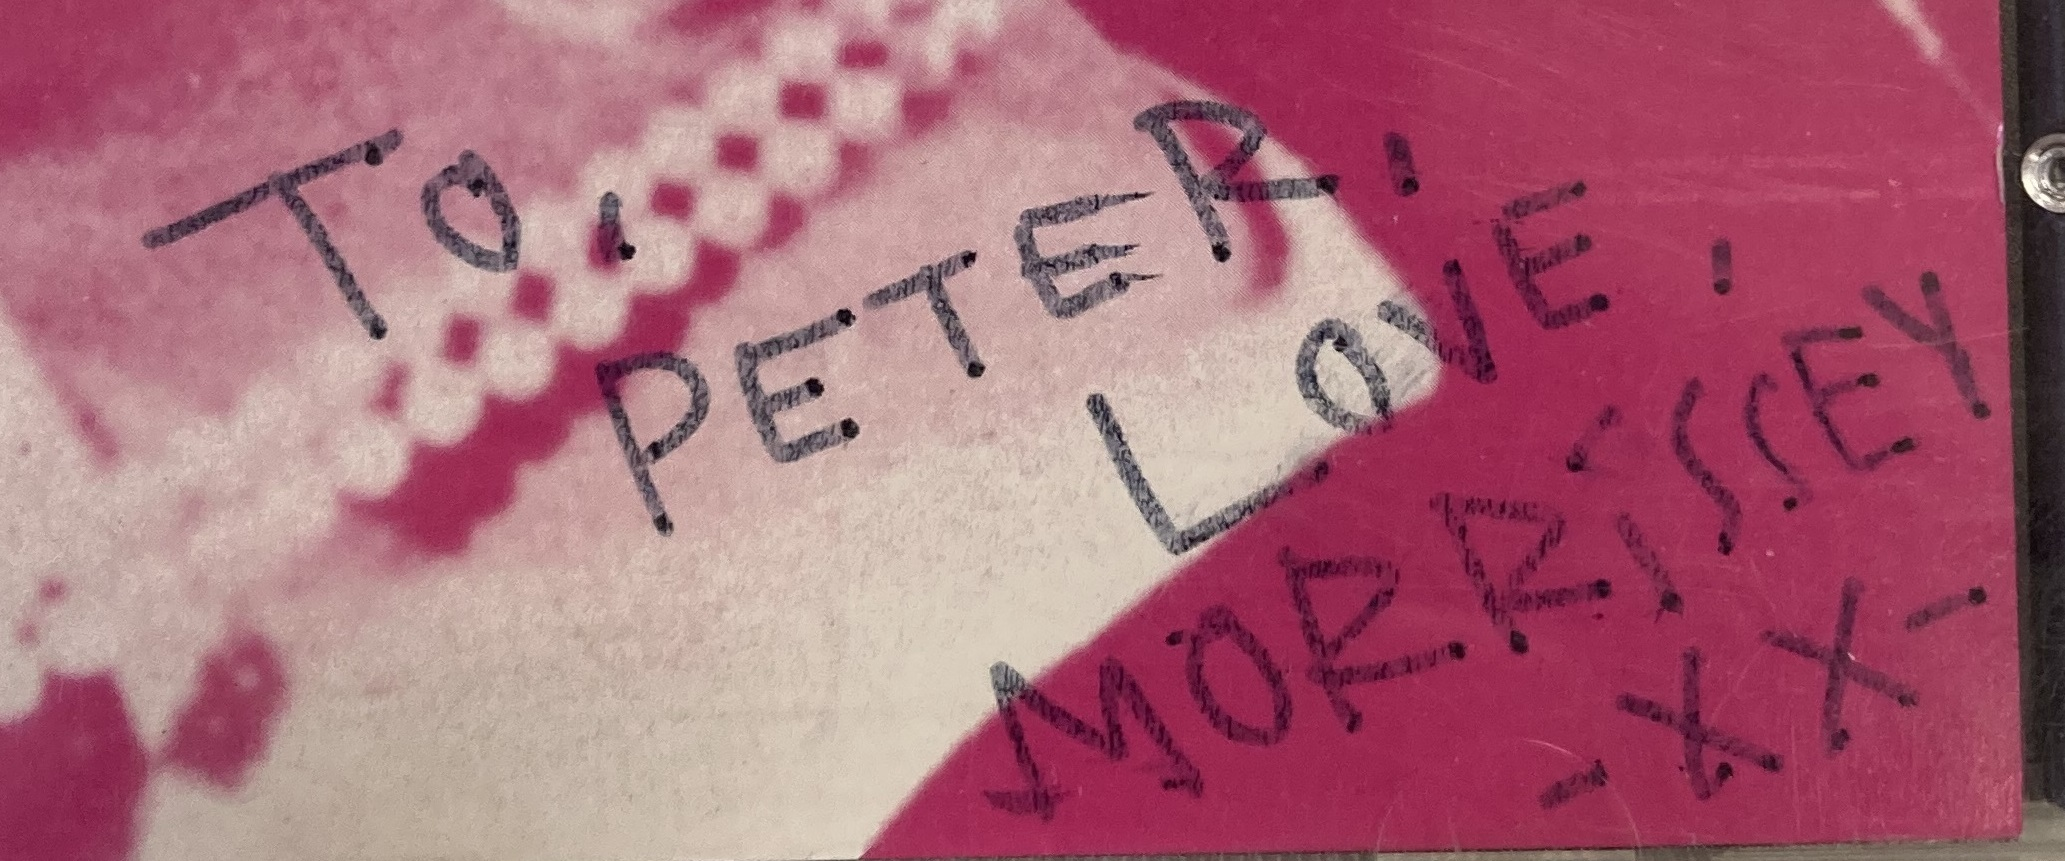 Morrissey signed CDs to Peter (vii).jpg